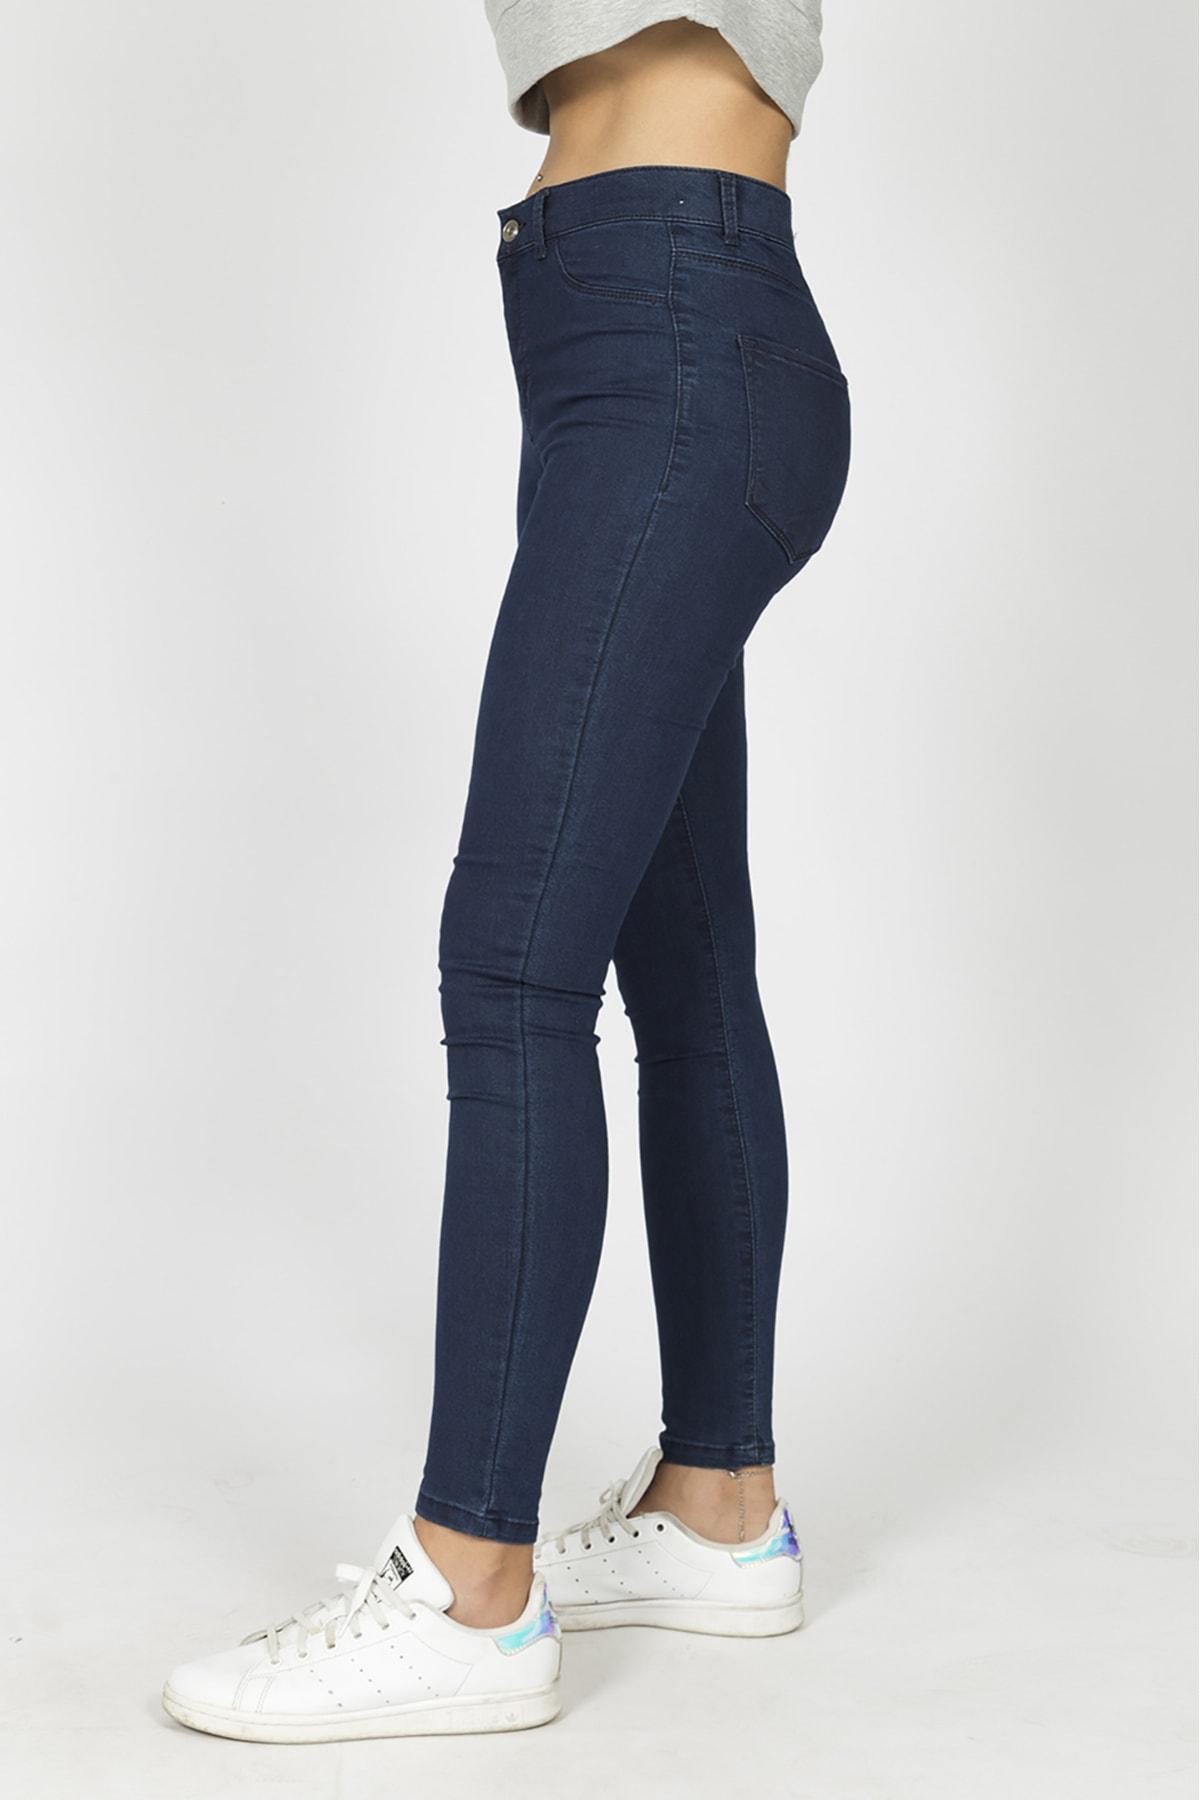 Berm Collection Kadın Lacivert Jeans Kot Pantolon 2